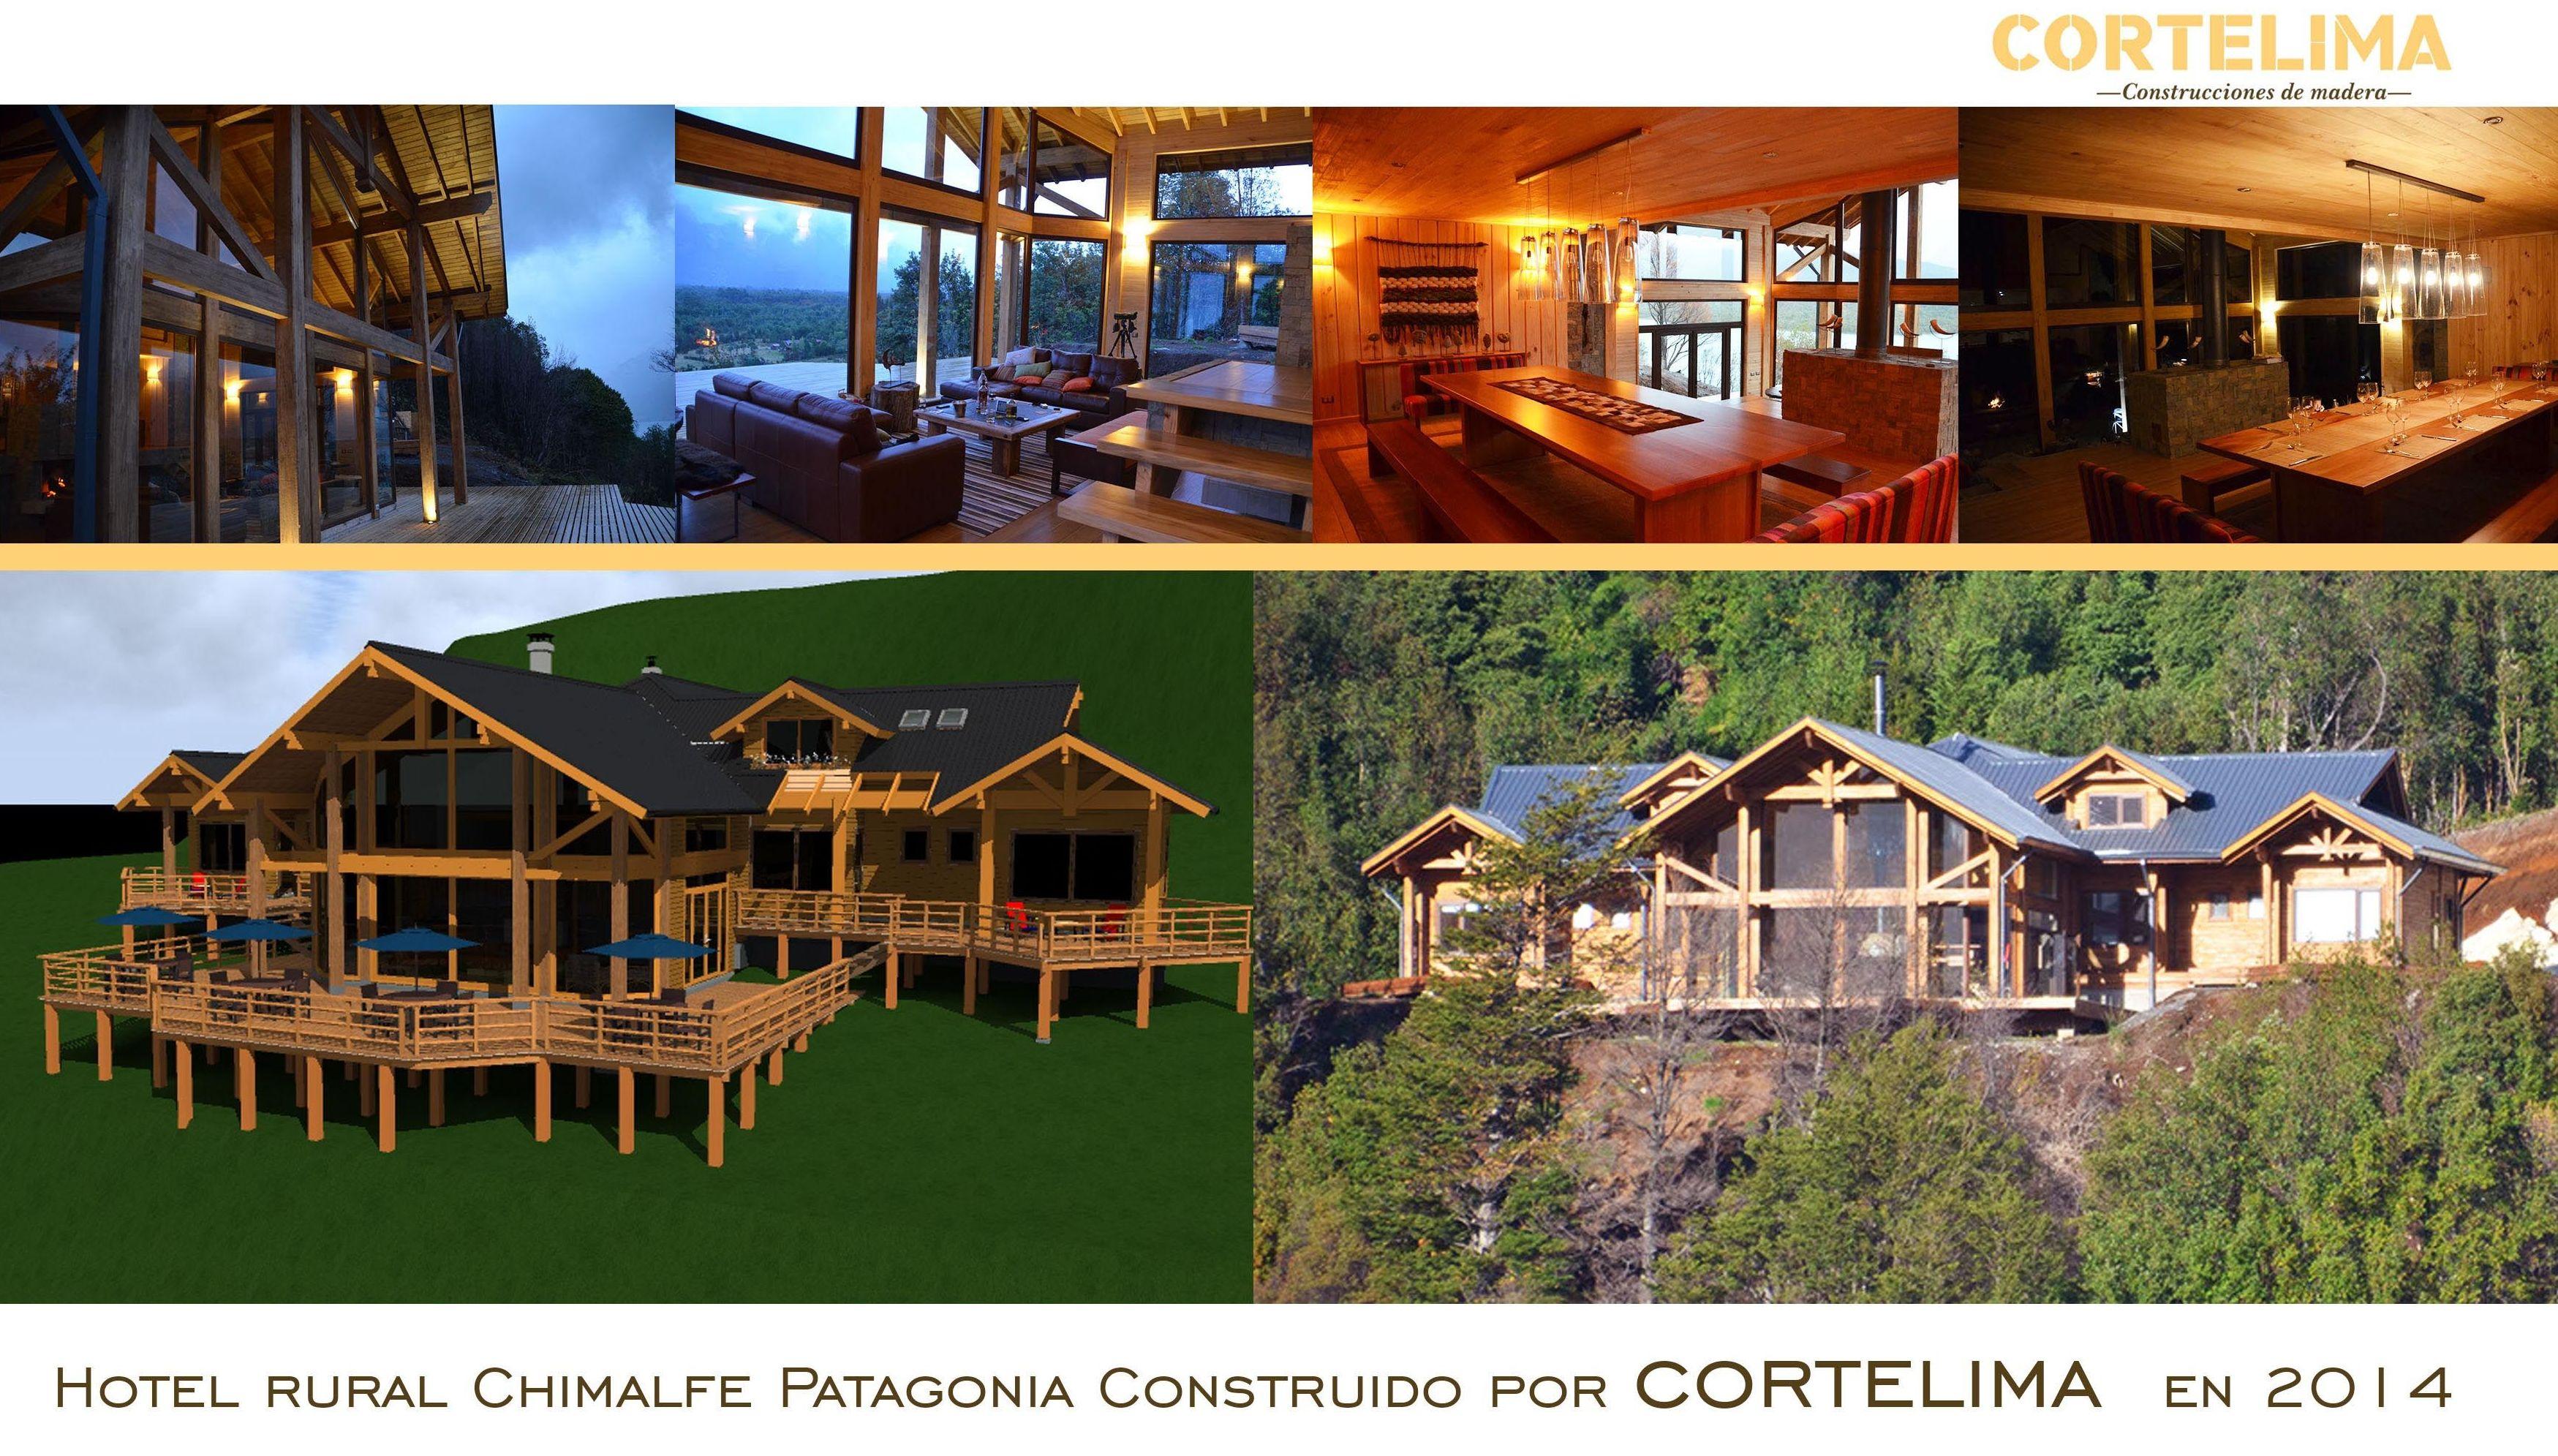 Hotel de Madera Construido por Cortelima